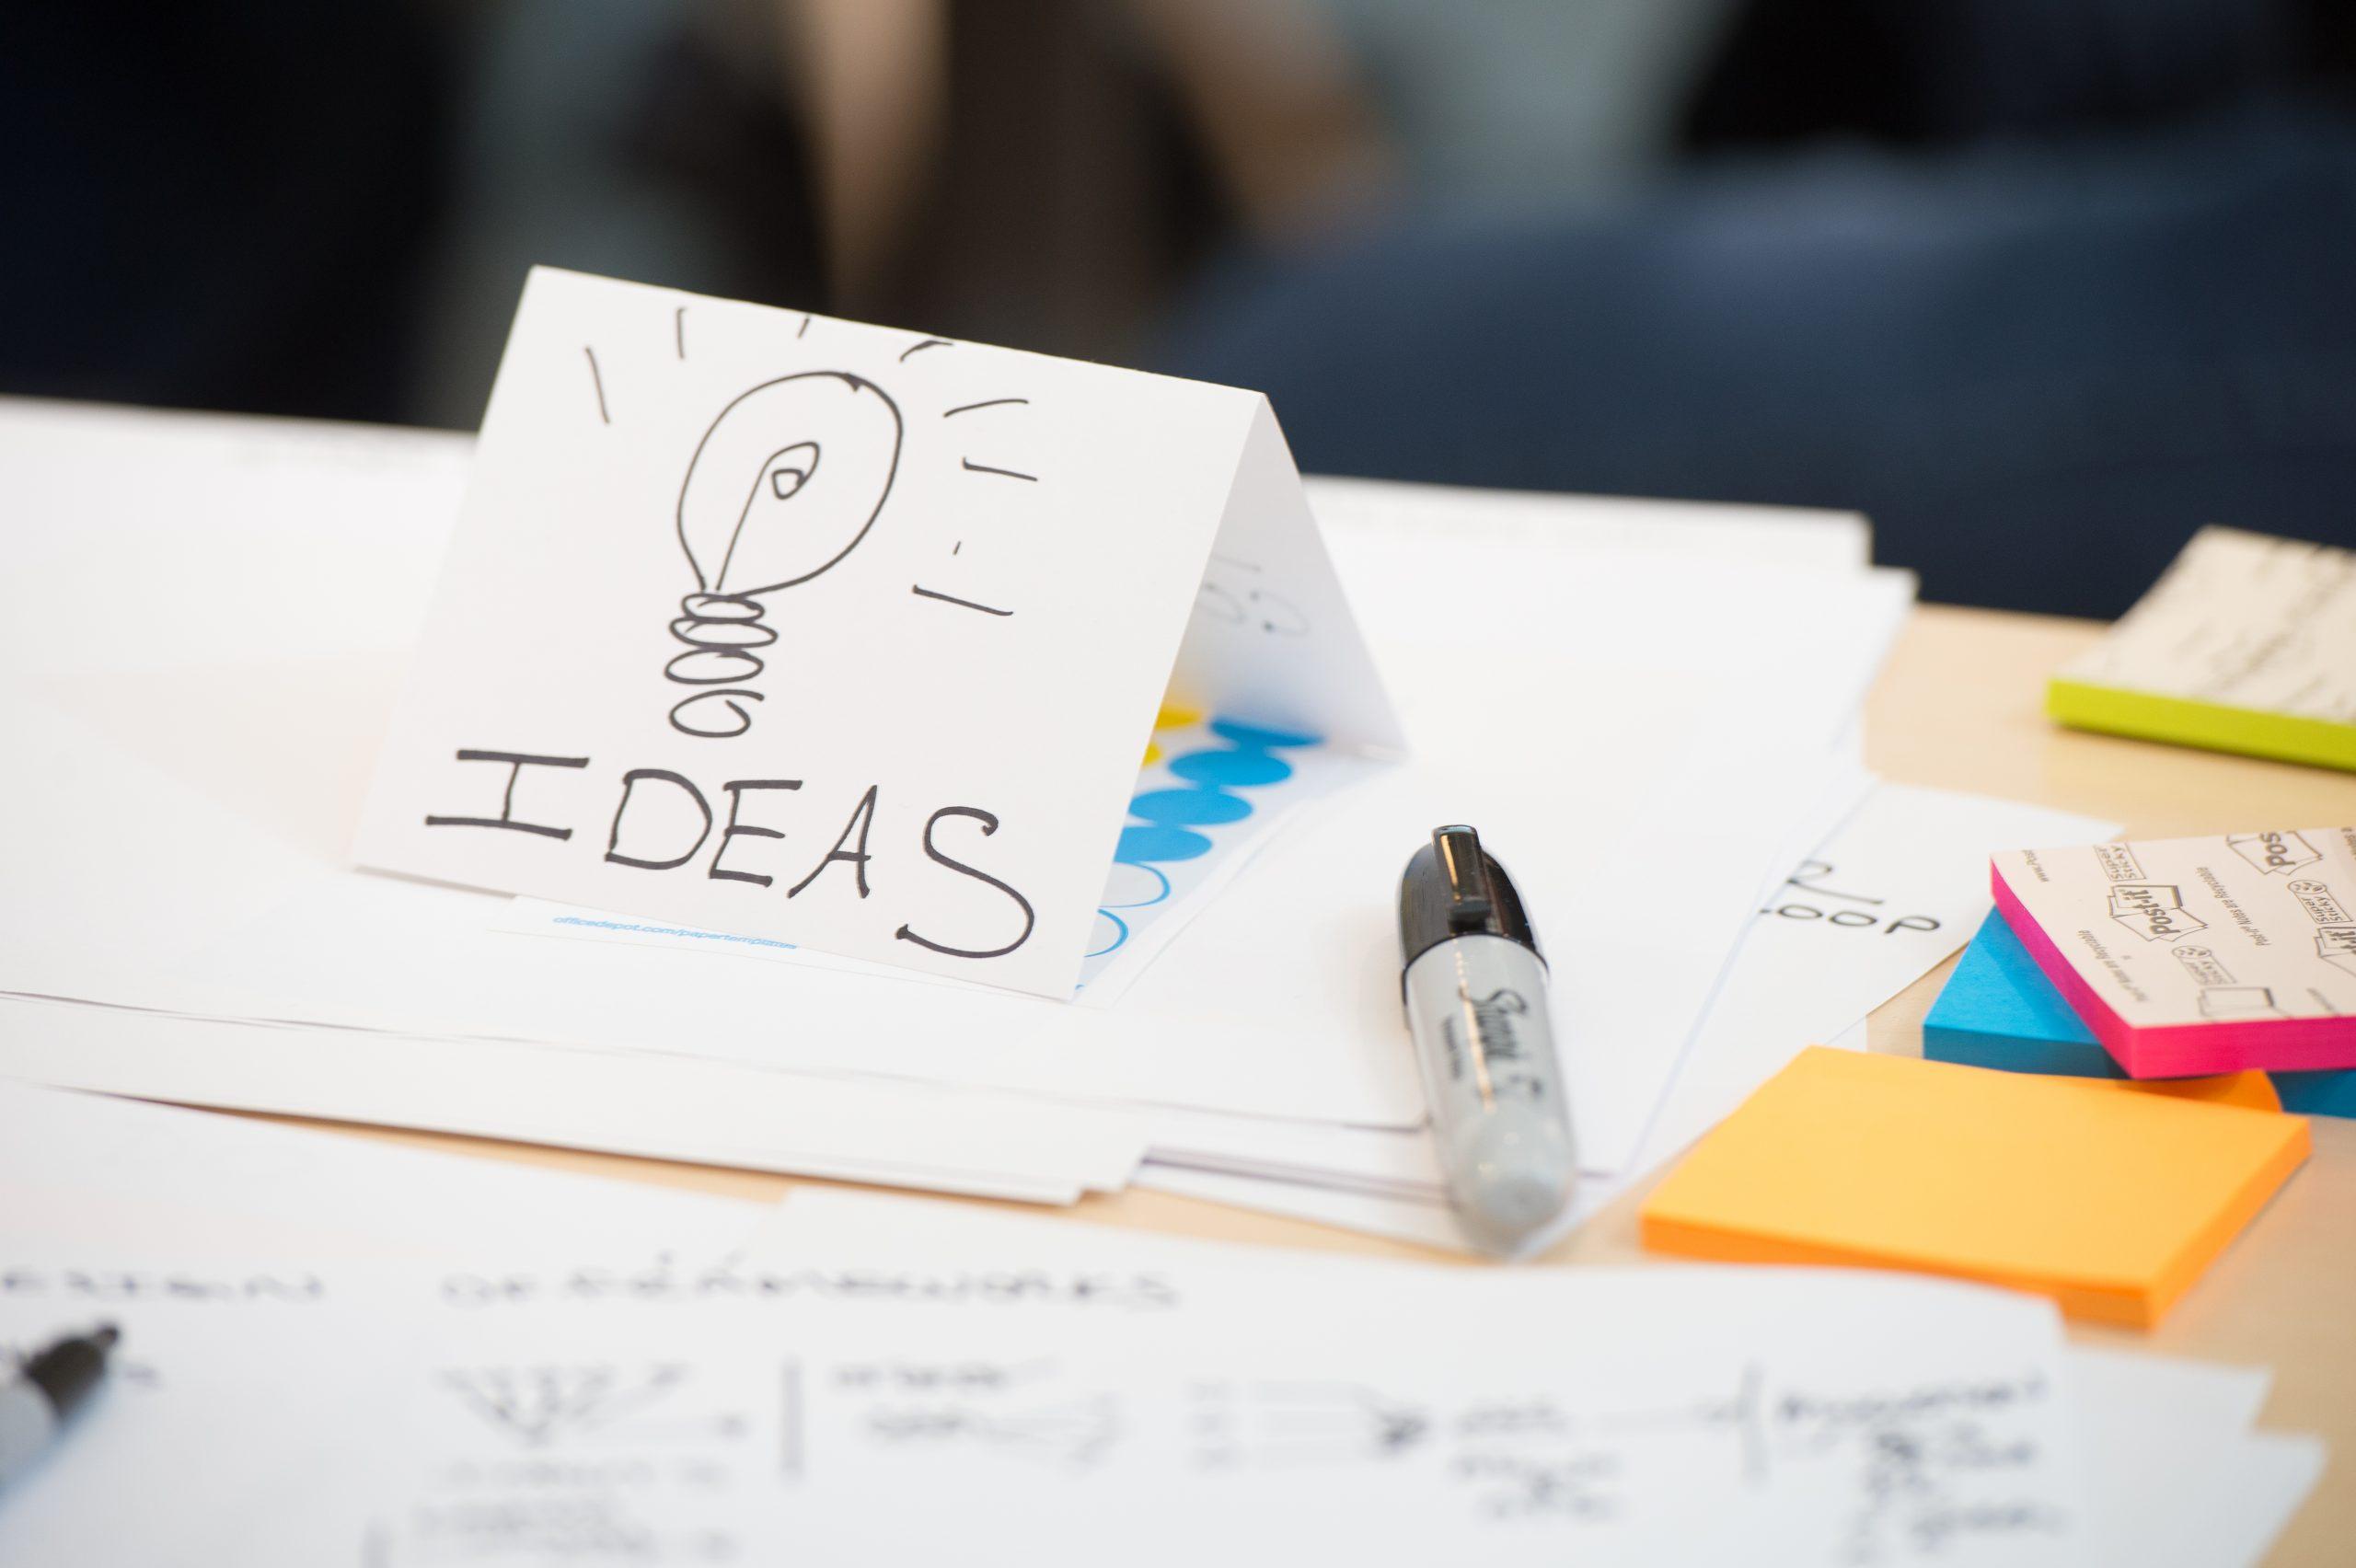 Ideas on paper